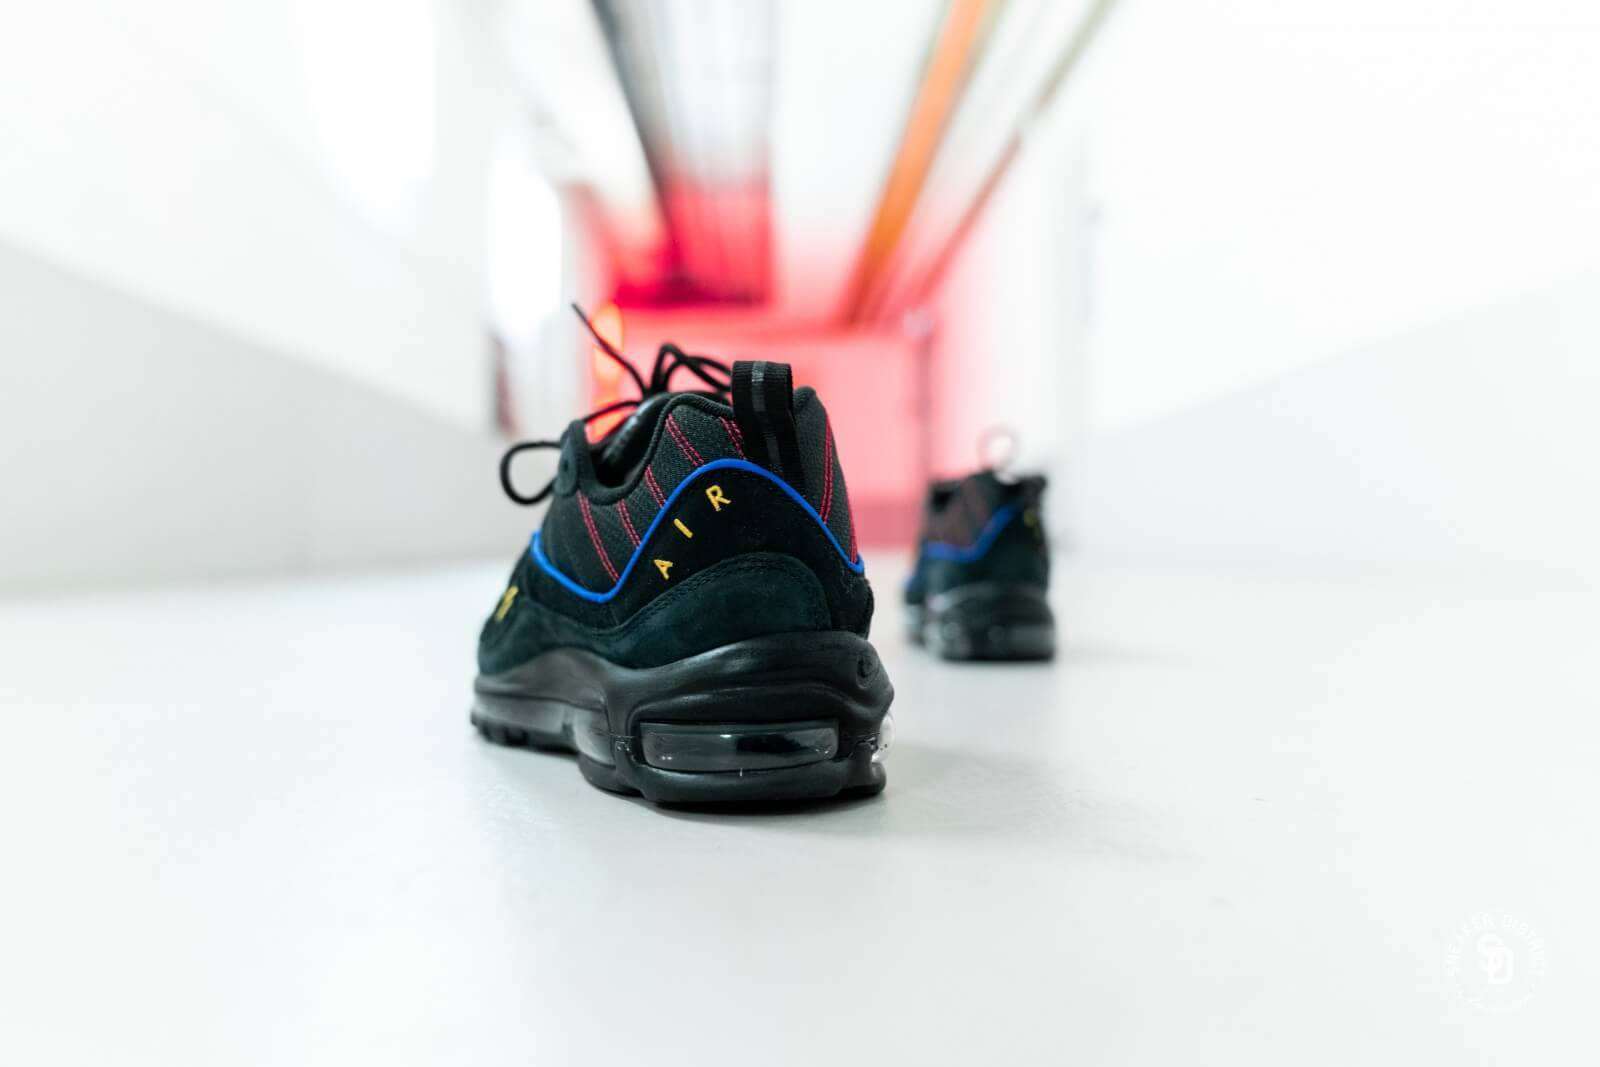 Nike Air Max 98 BlackAmarillo University Red CD1537 001